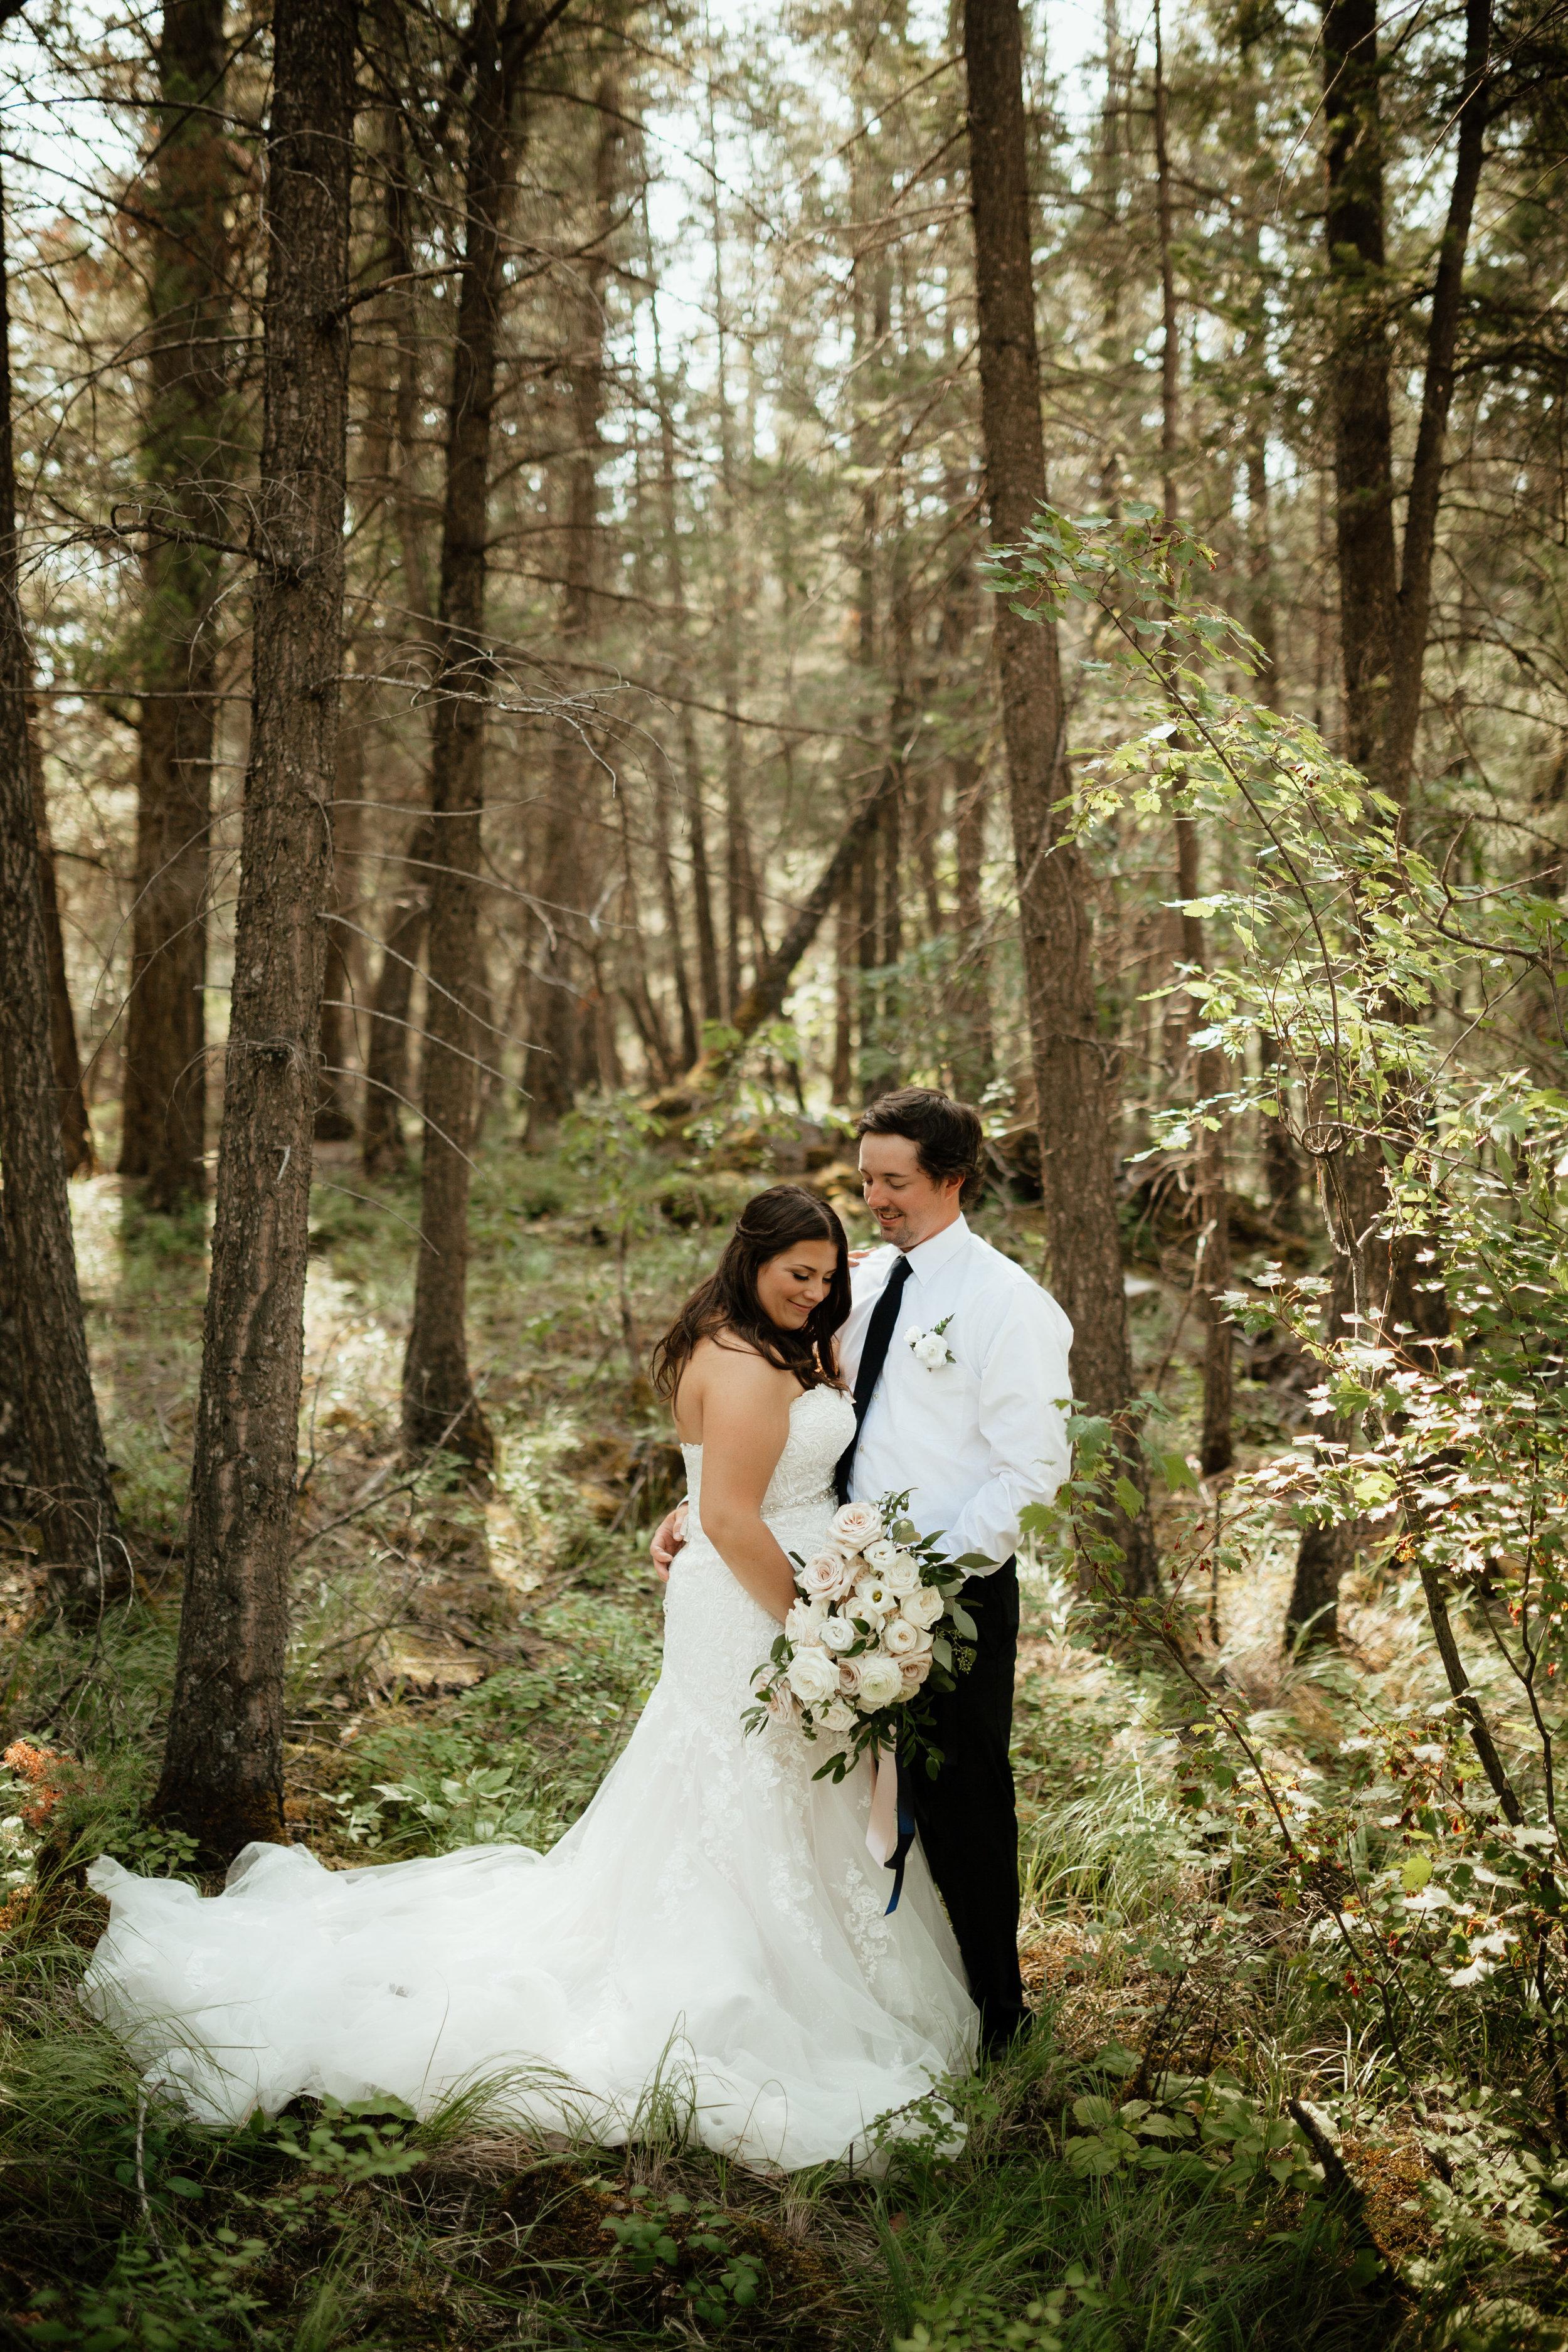 Trevor + Krista 5 - Bridal Portraits-167.jpg